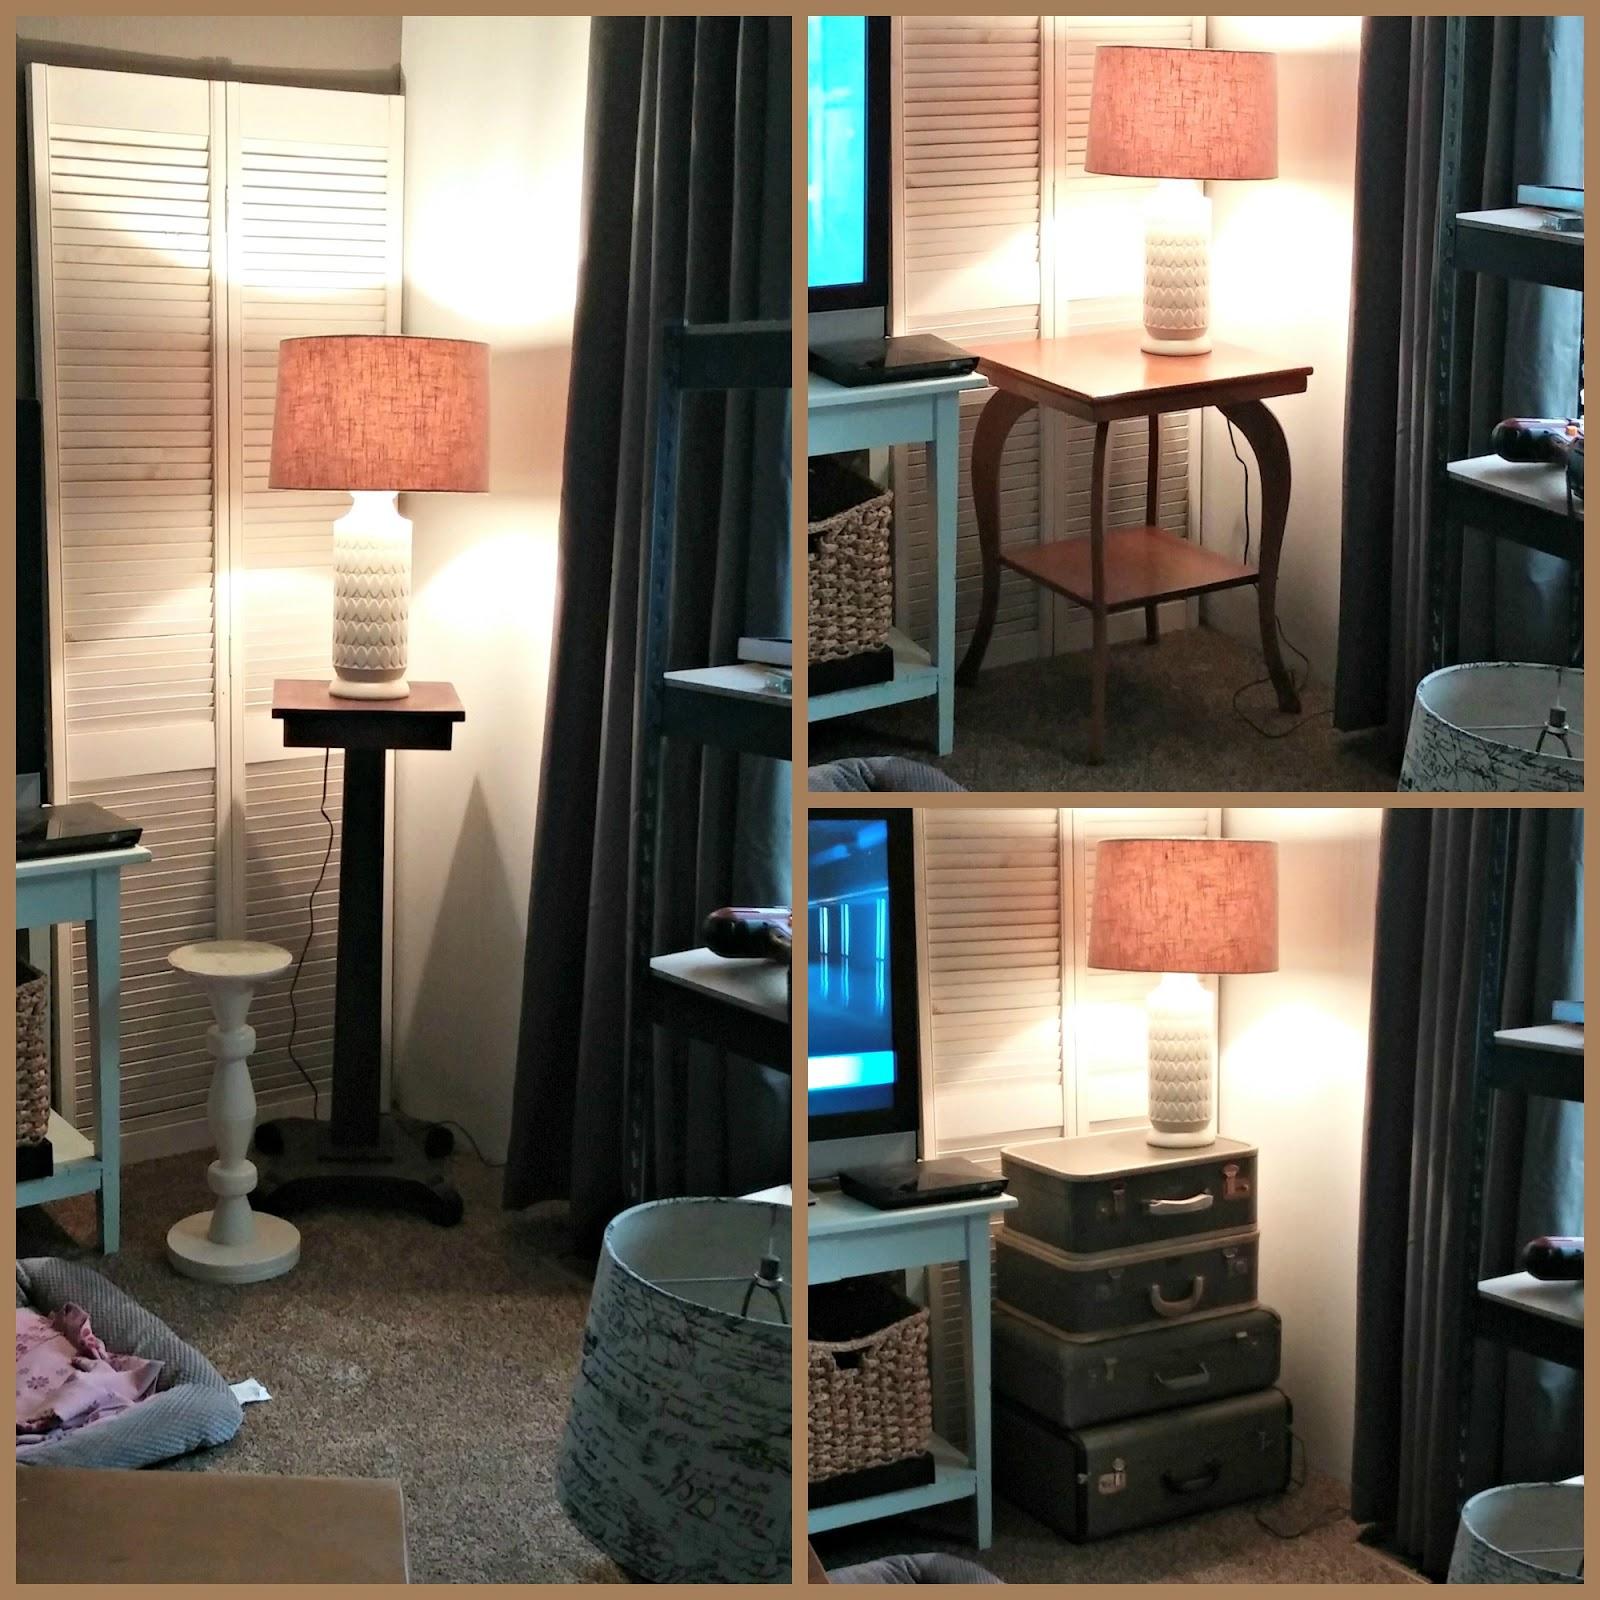 Cozy Minimalist Living Room: Cozy Minimalist Living Room Progress